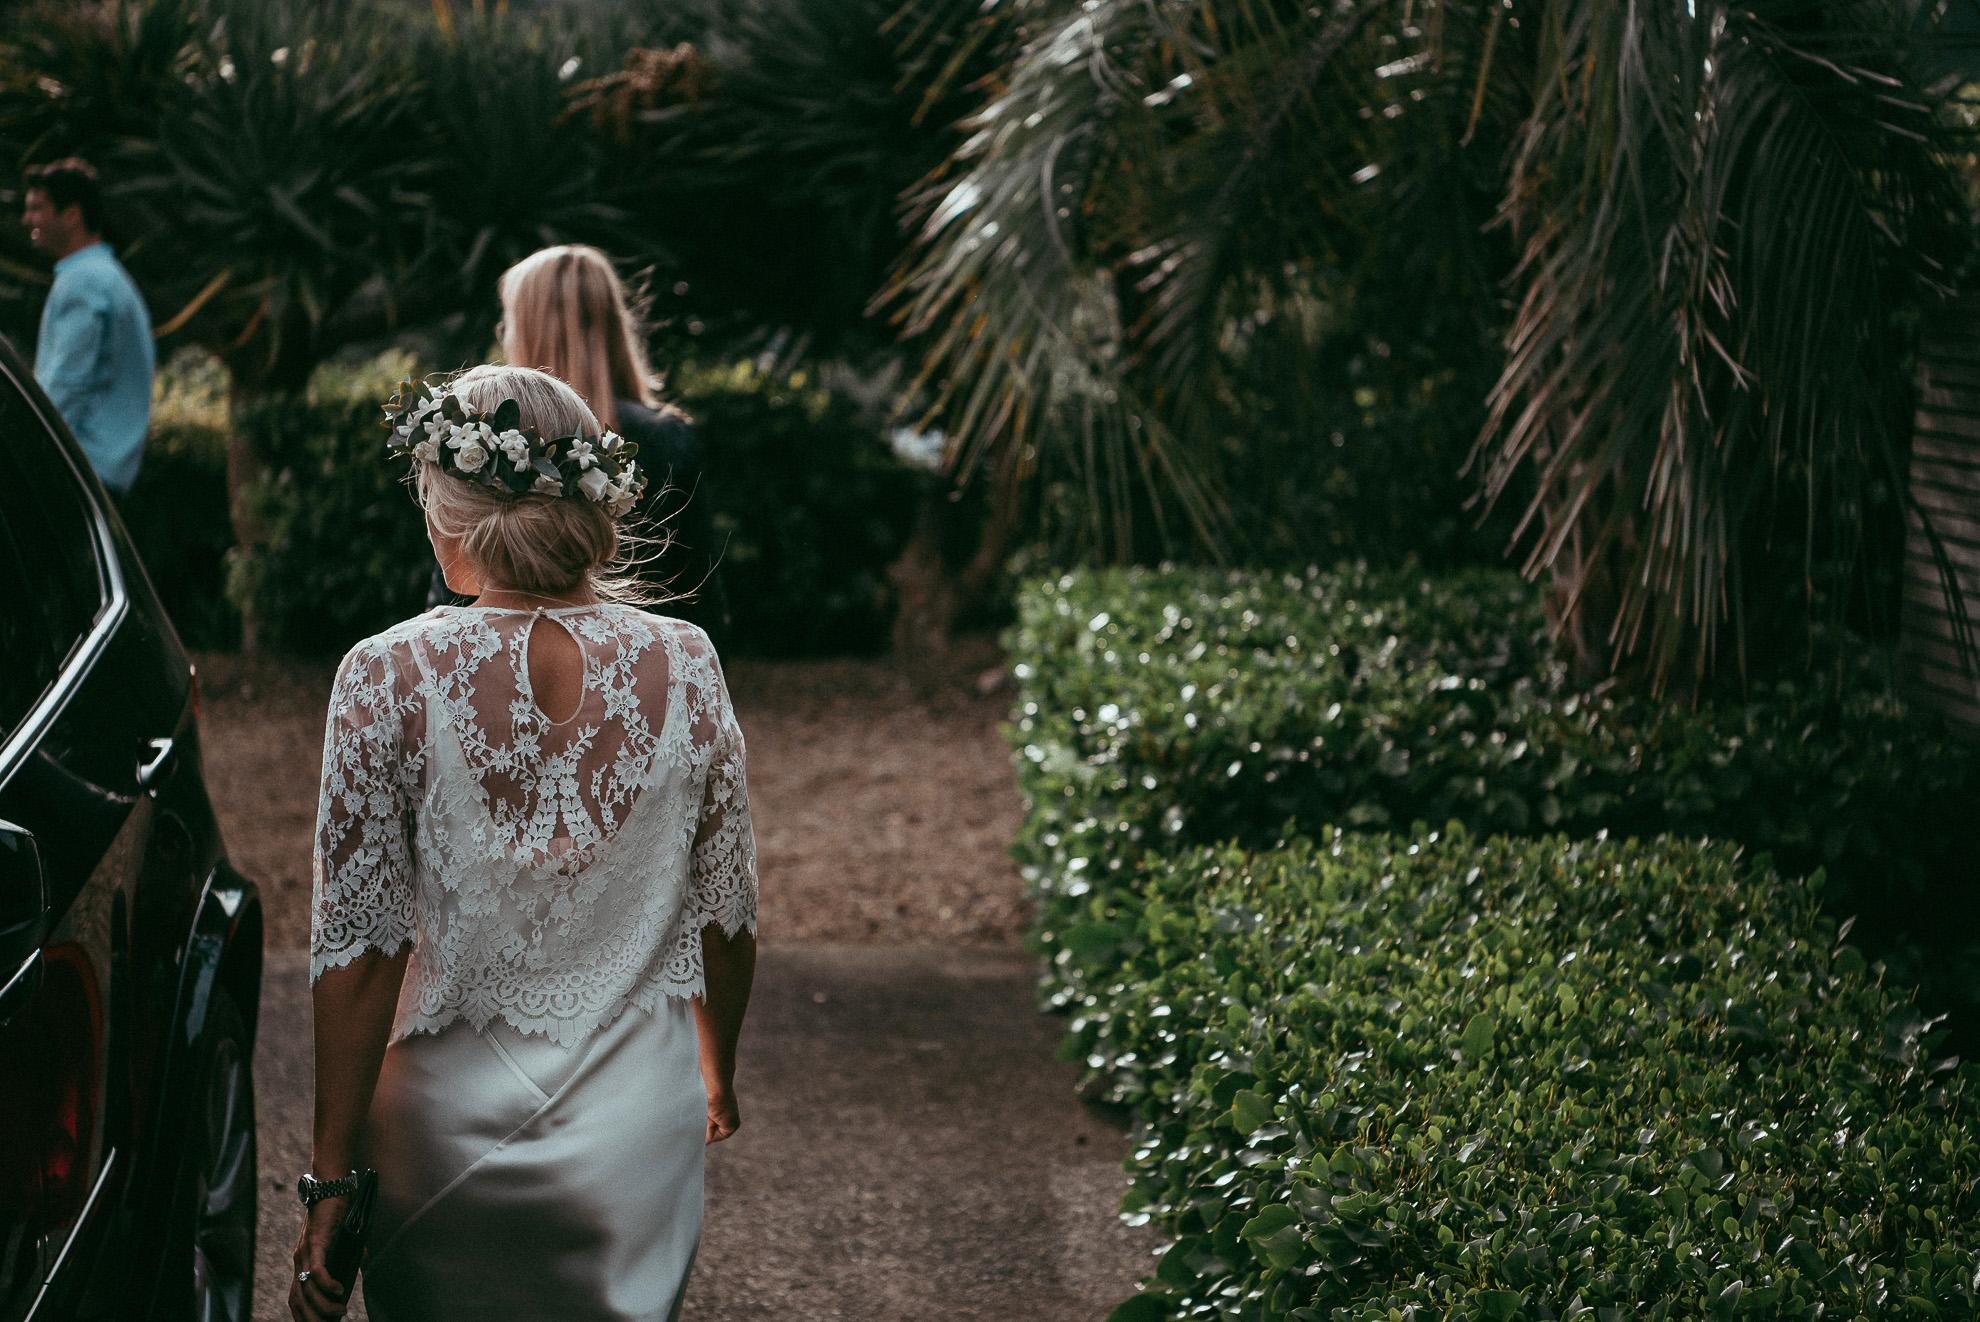 wedding-by-olgalevien-325.JPG